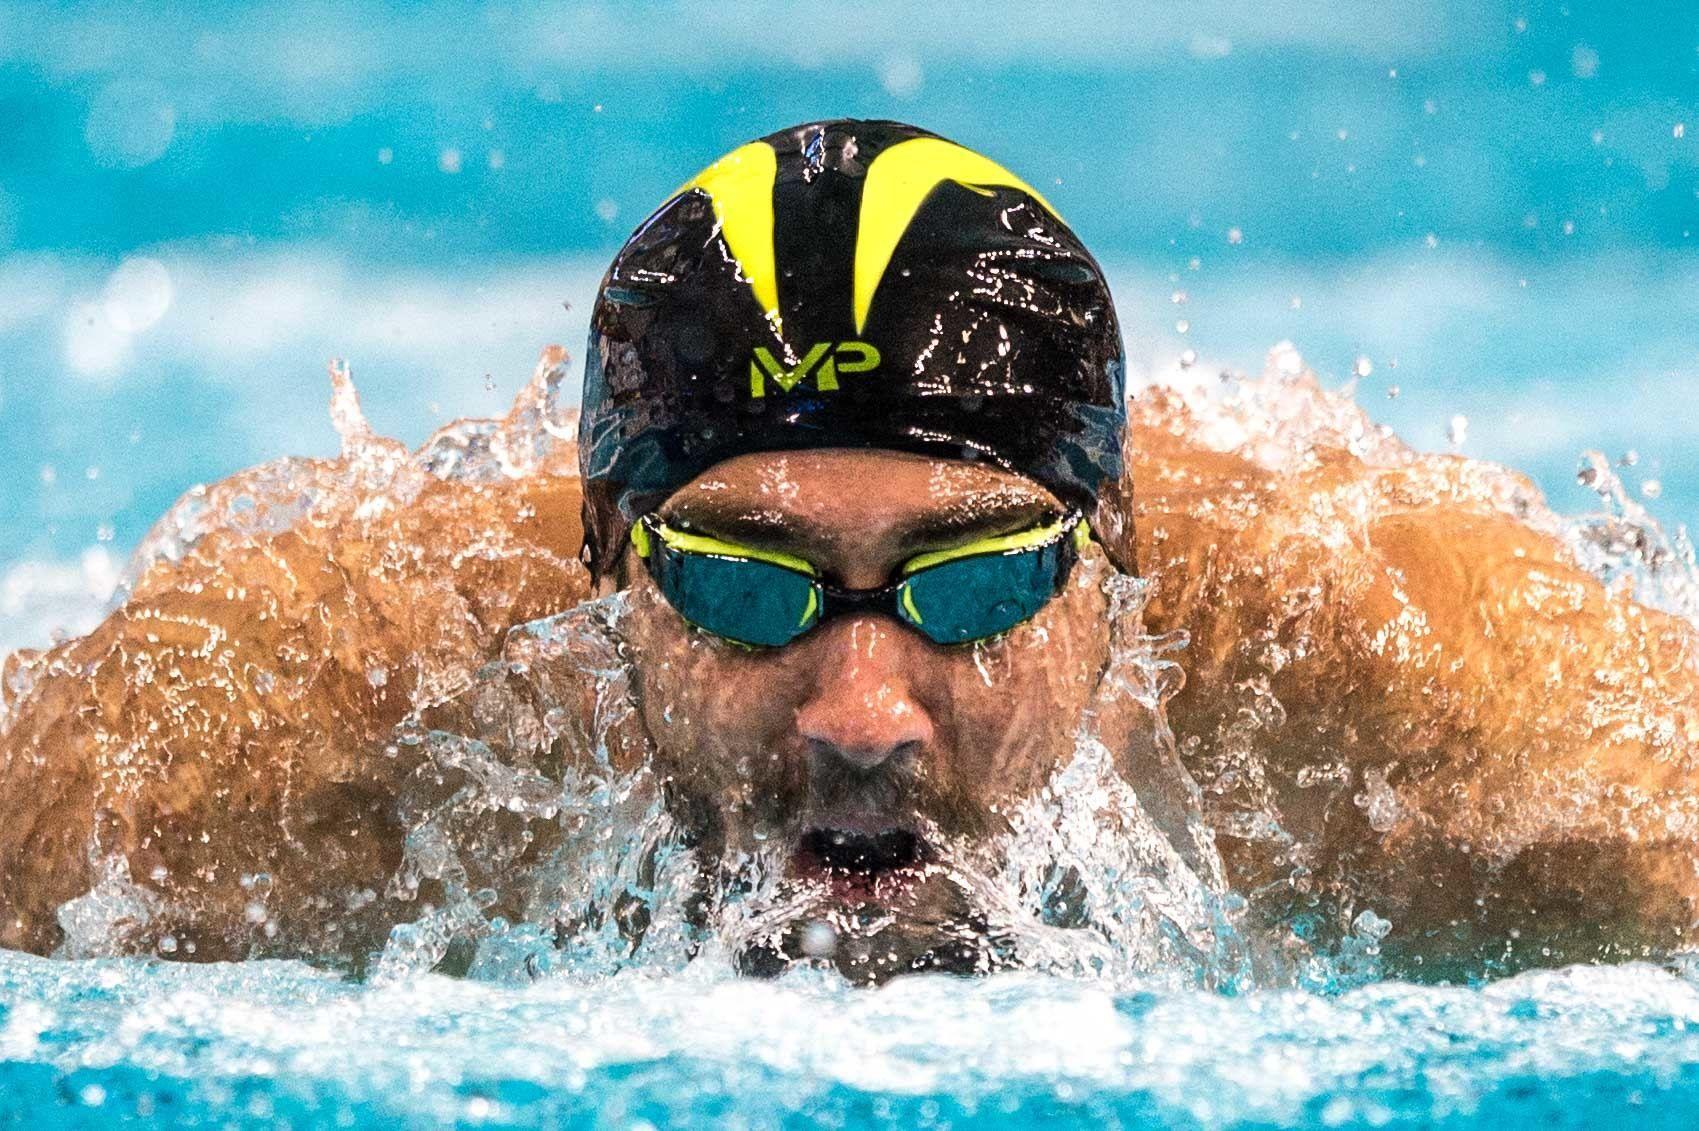 air jordan 1 olympic 2008 swimmer